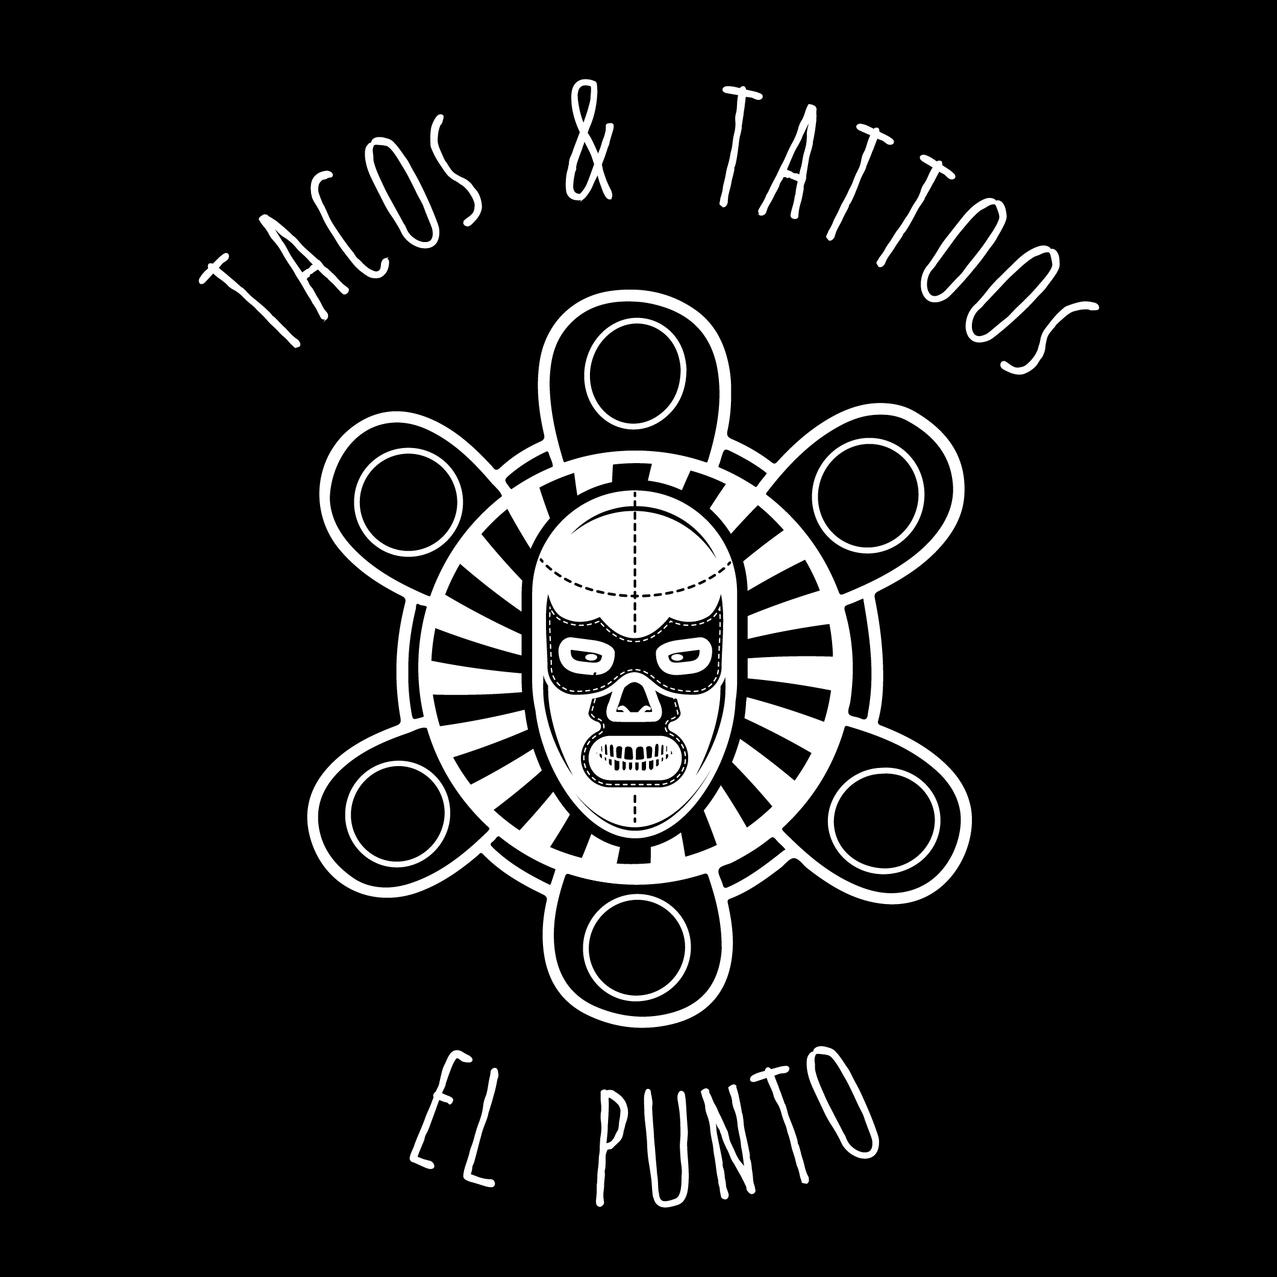 Tacos and Tattoos El Punto